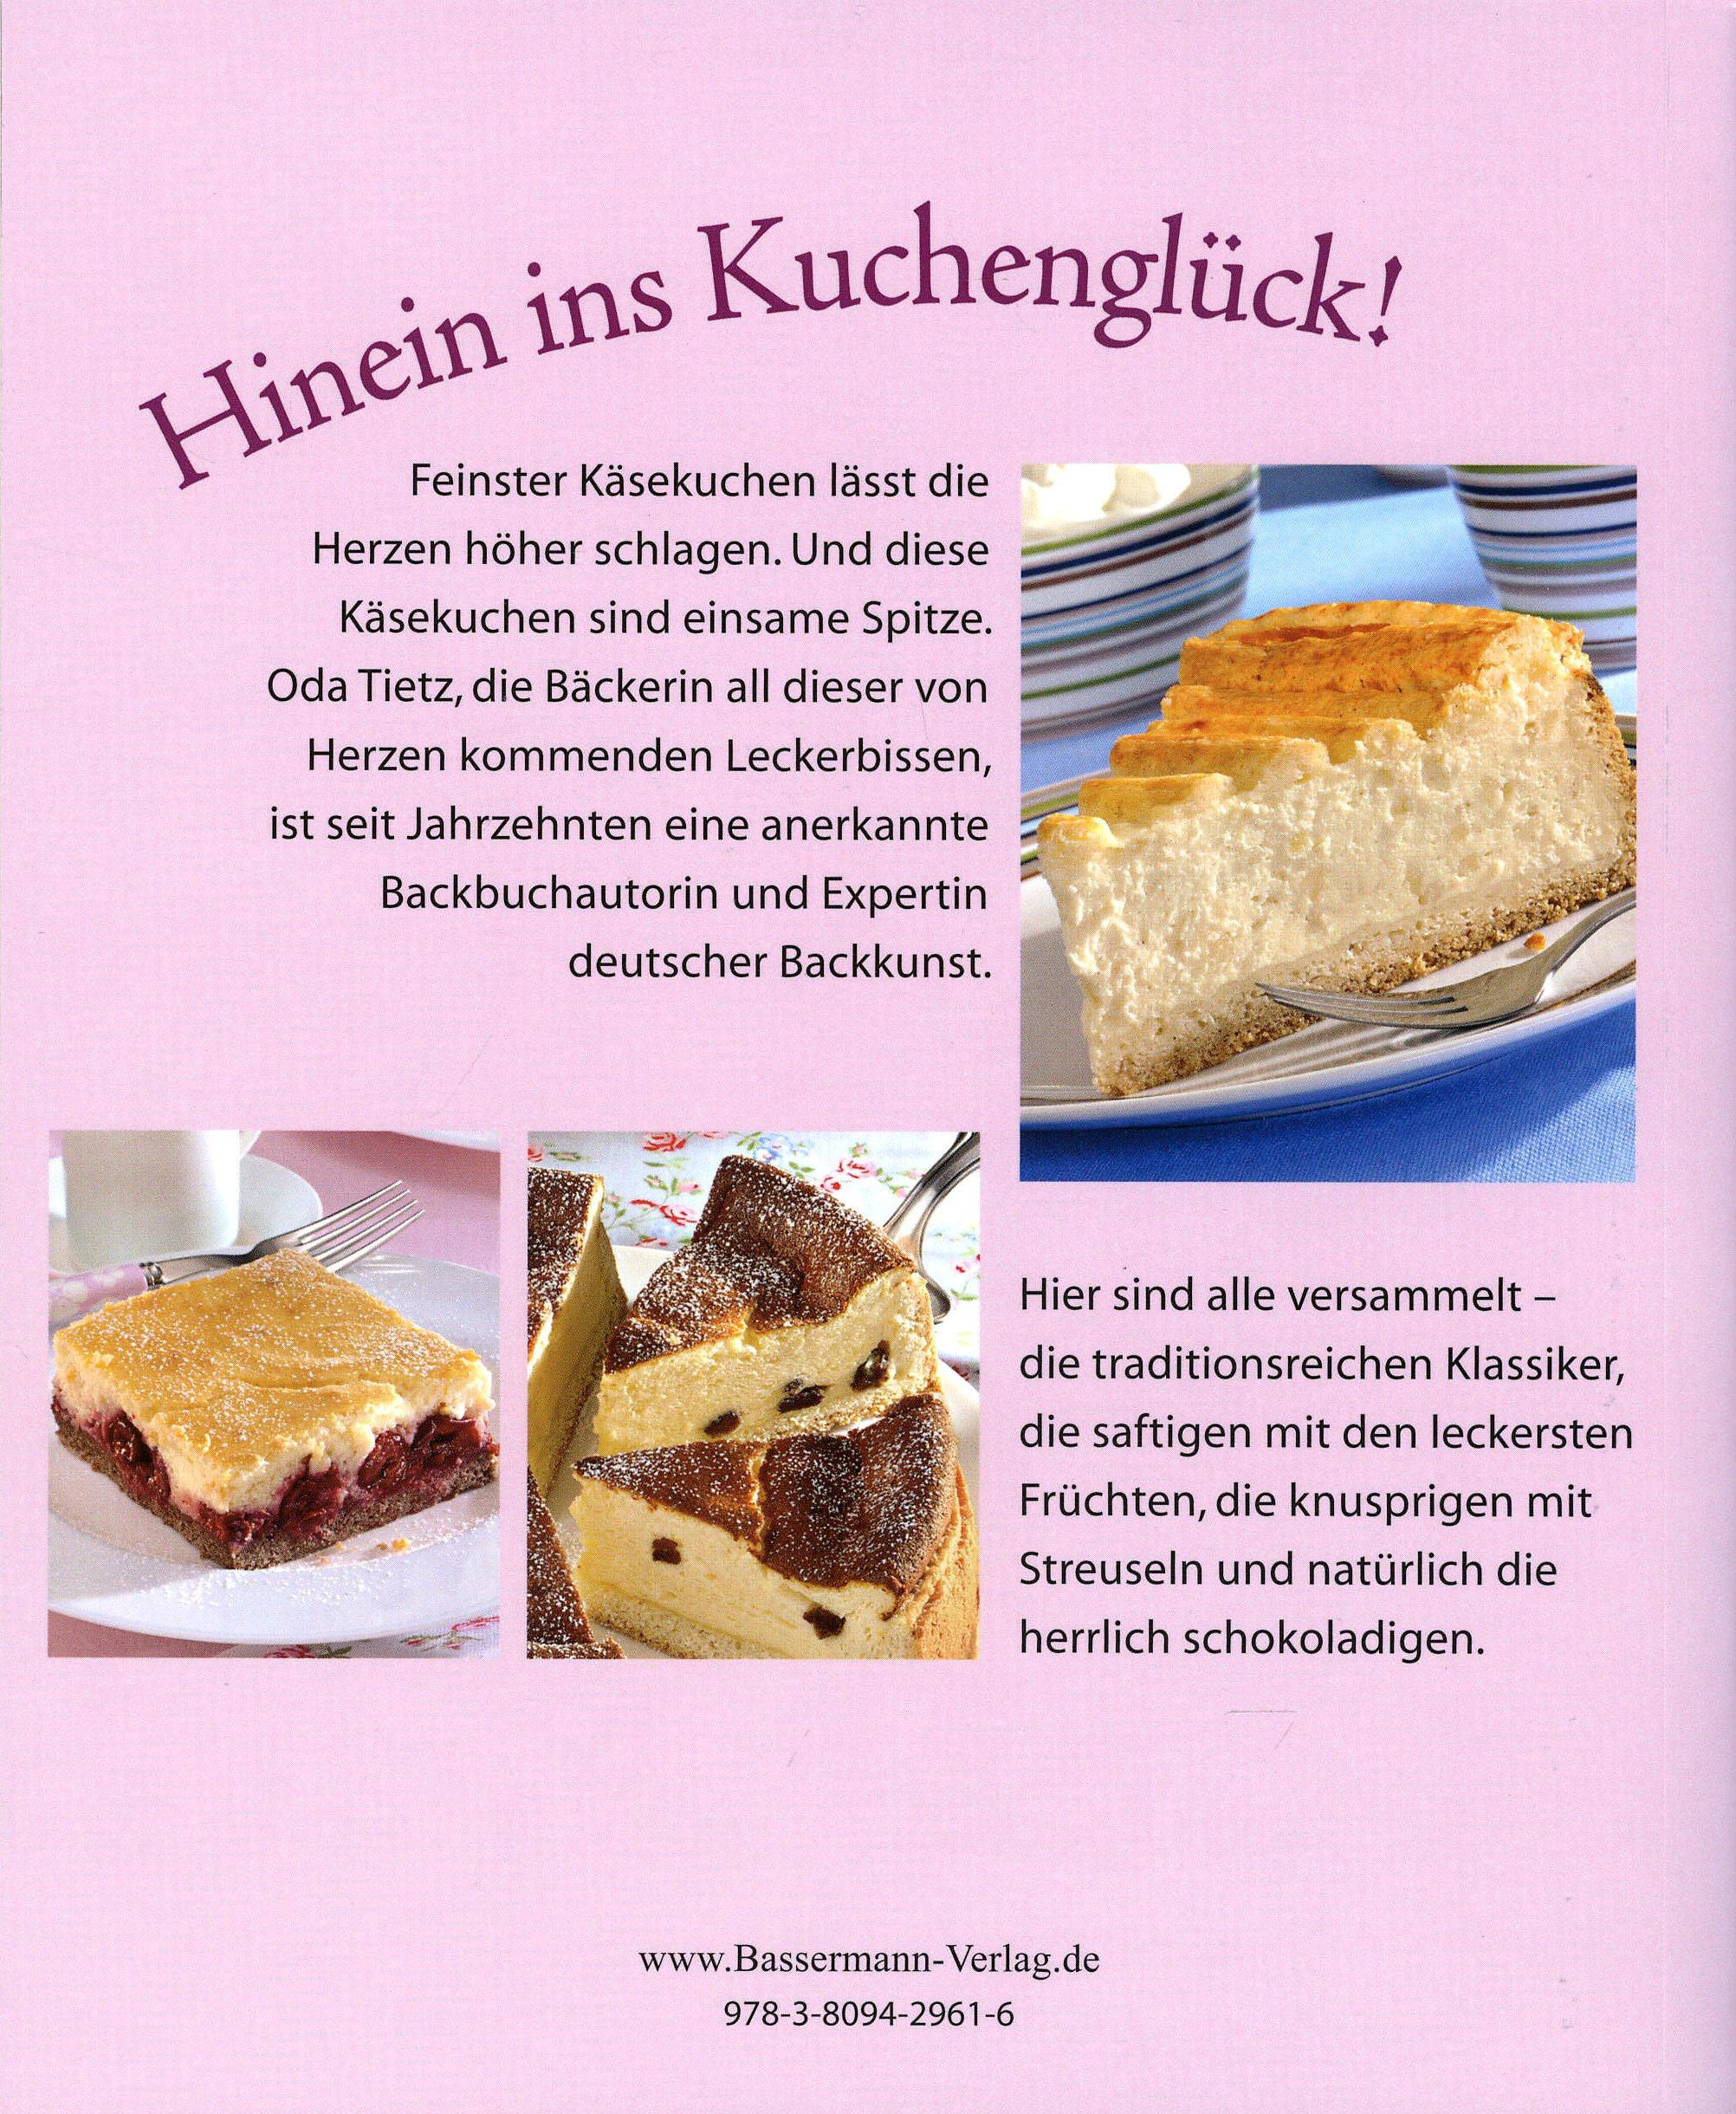 Kleine Kasekuchen Vom Blech Rezeptbuch Inklusive Backform Buch